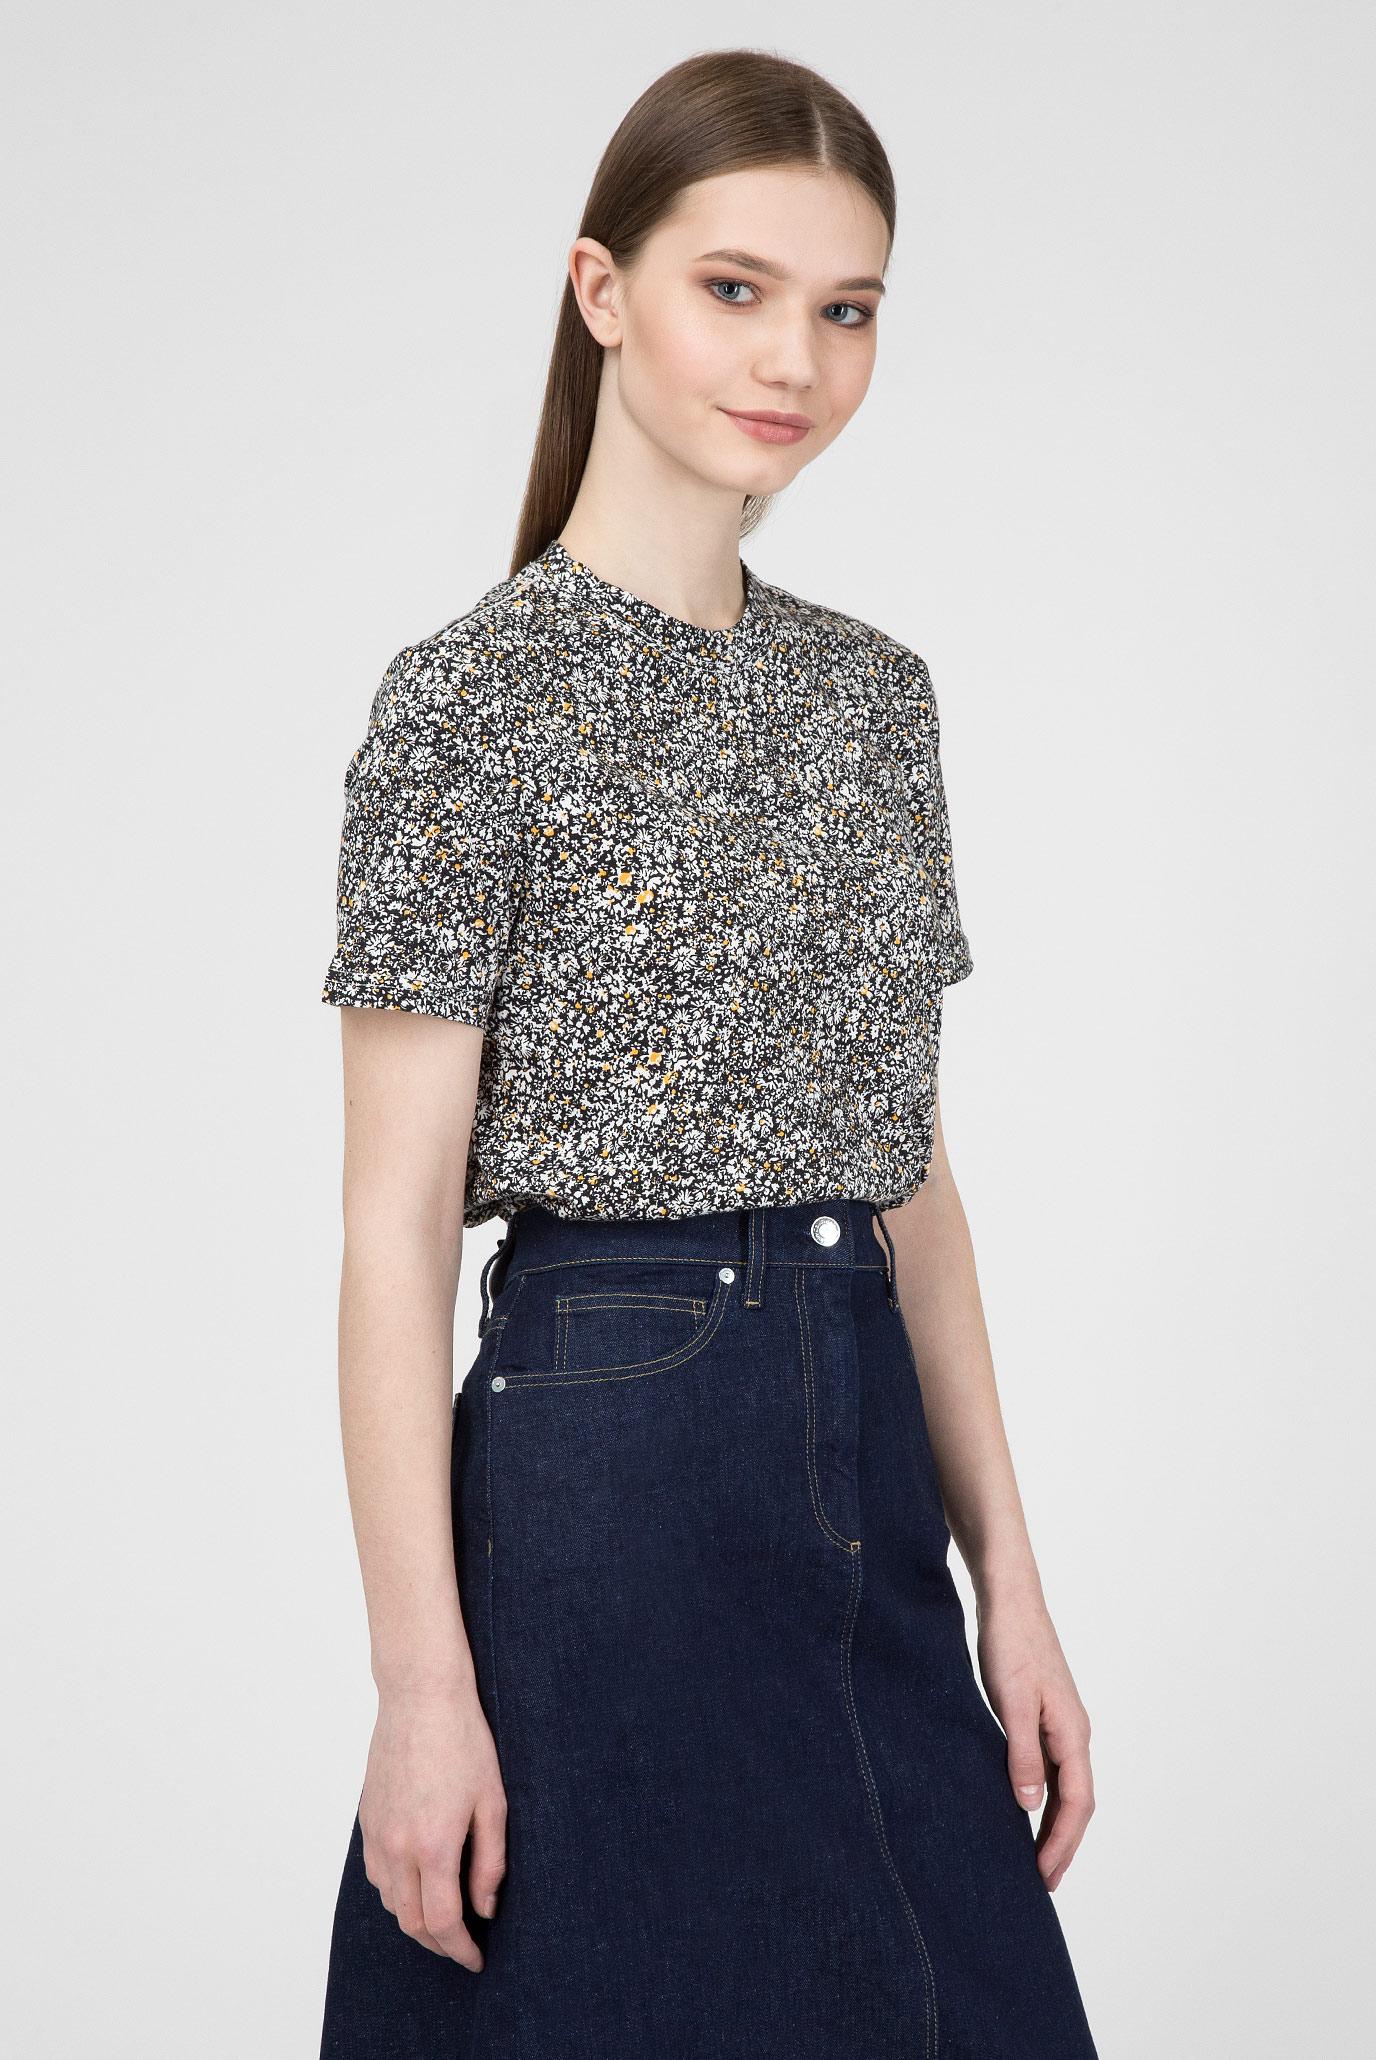 Женская футболка с принтом MINI FLORAL PRT T-SHIRT SS Calvin Klein